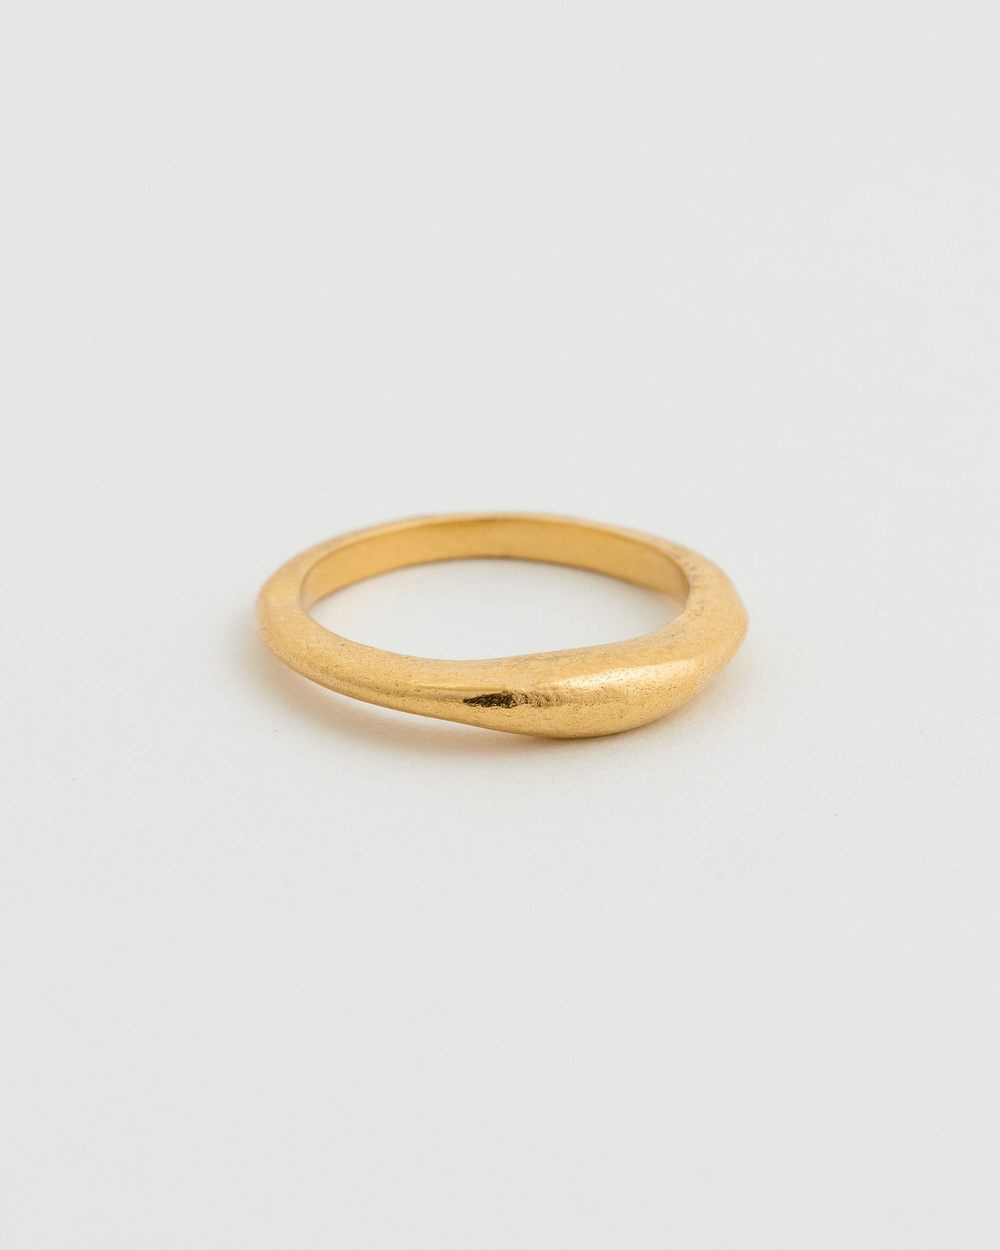 Kirstin Ash Golden Light Stacking Ring Jewellery Gold